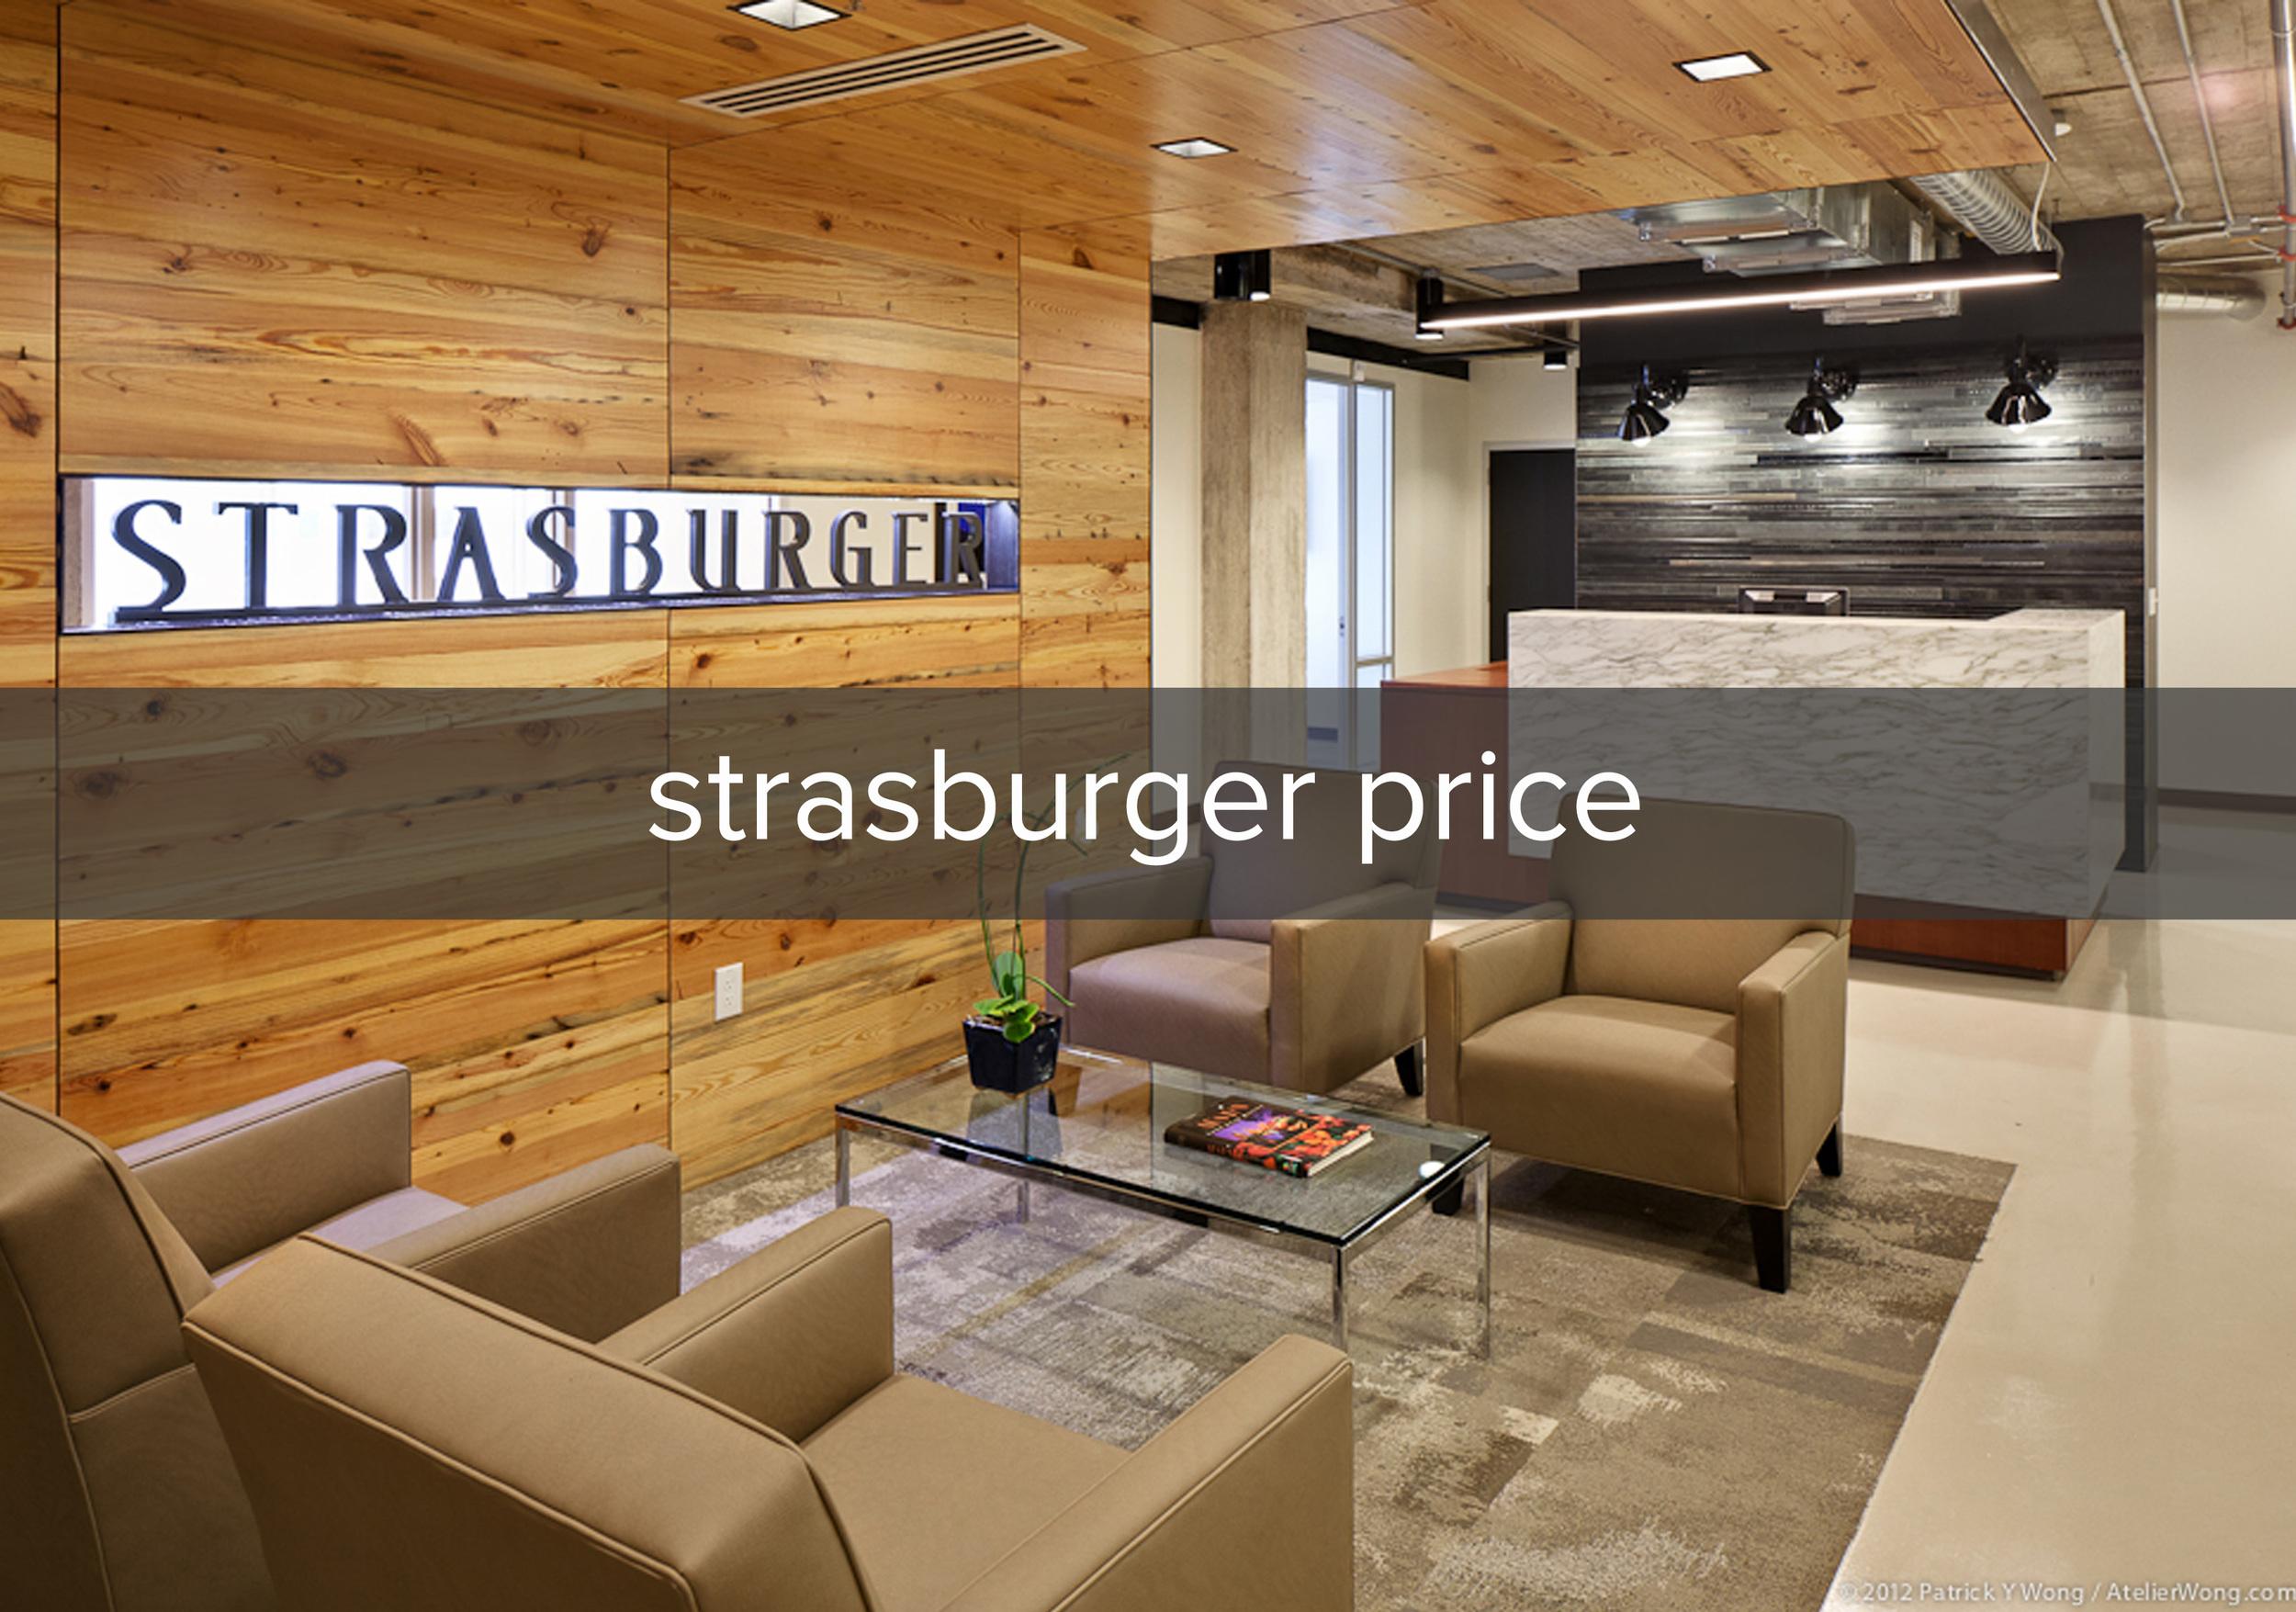 strasburger price.jpg